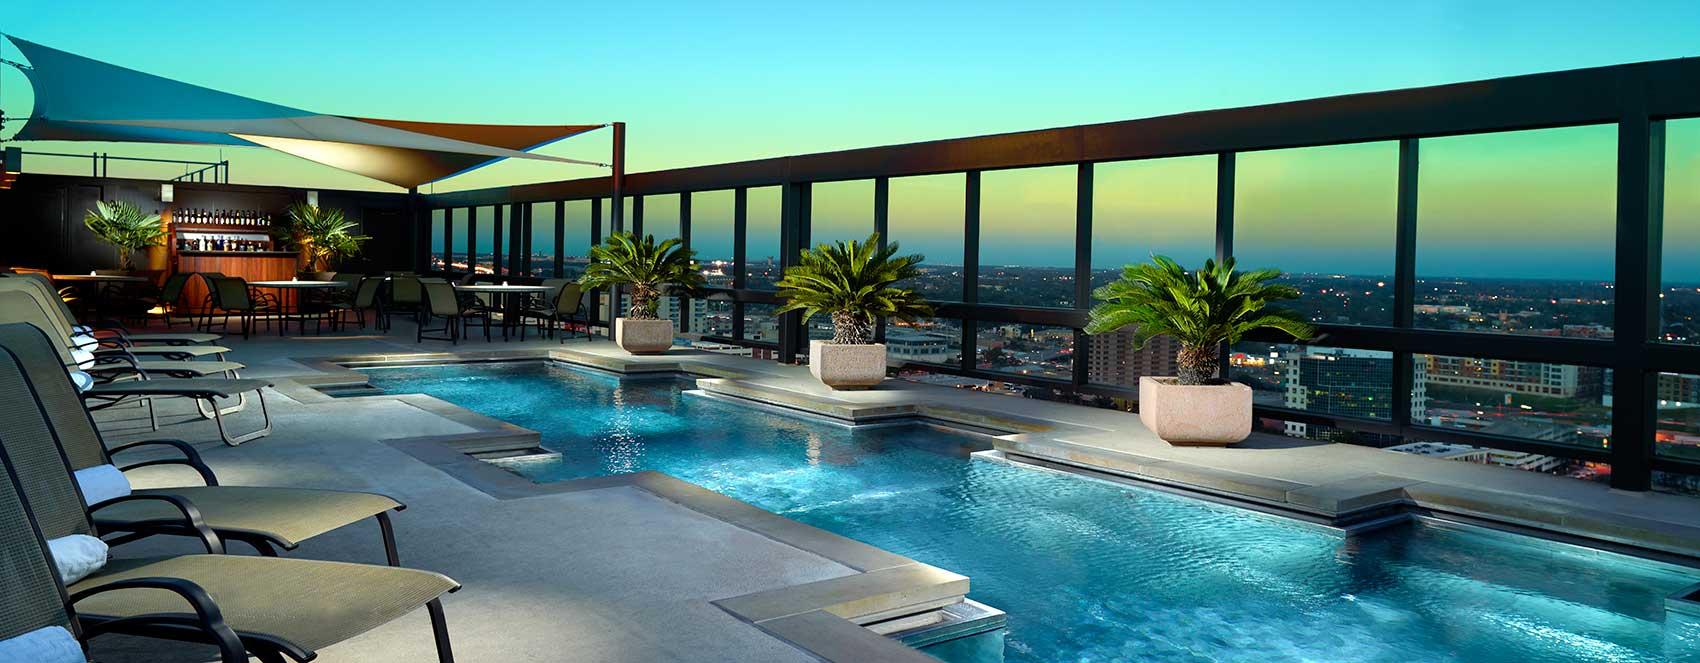 ausctr-omni-austin-hotel-downtown-evening-pool-1700x663.jpg